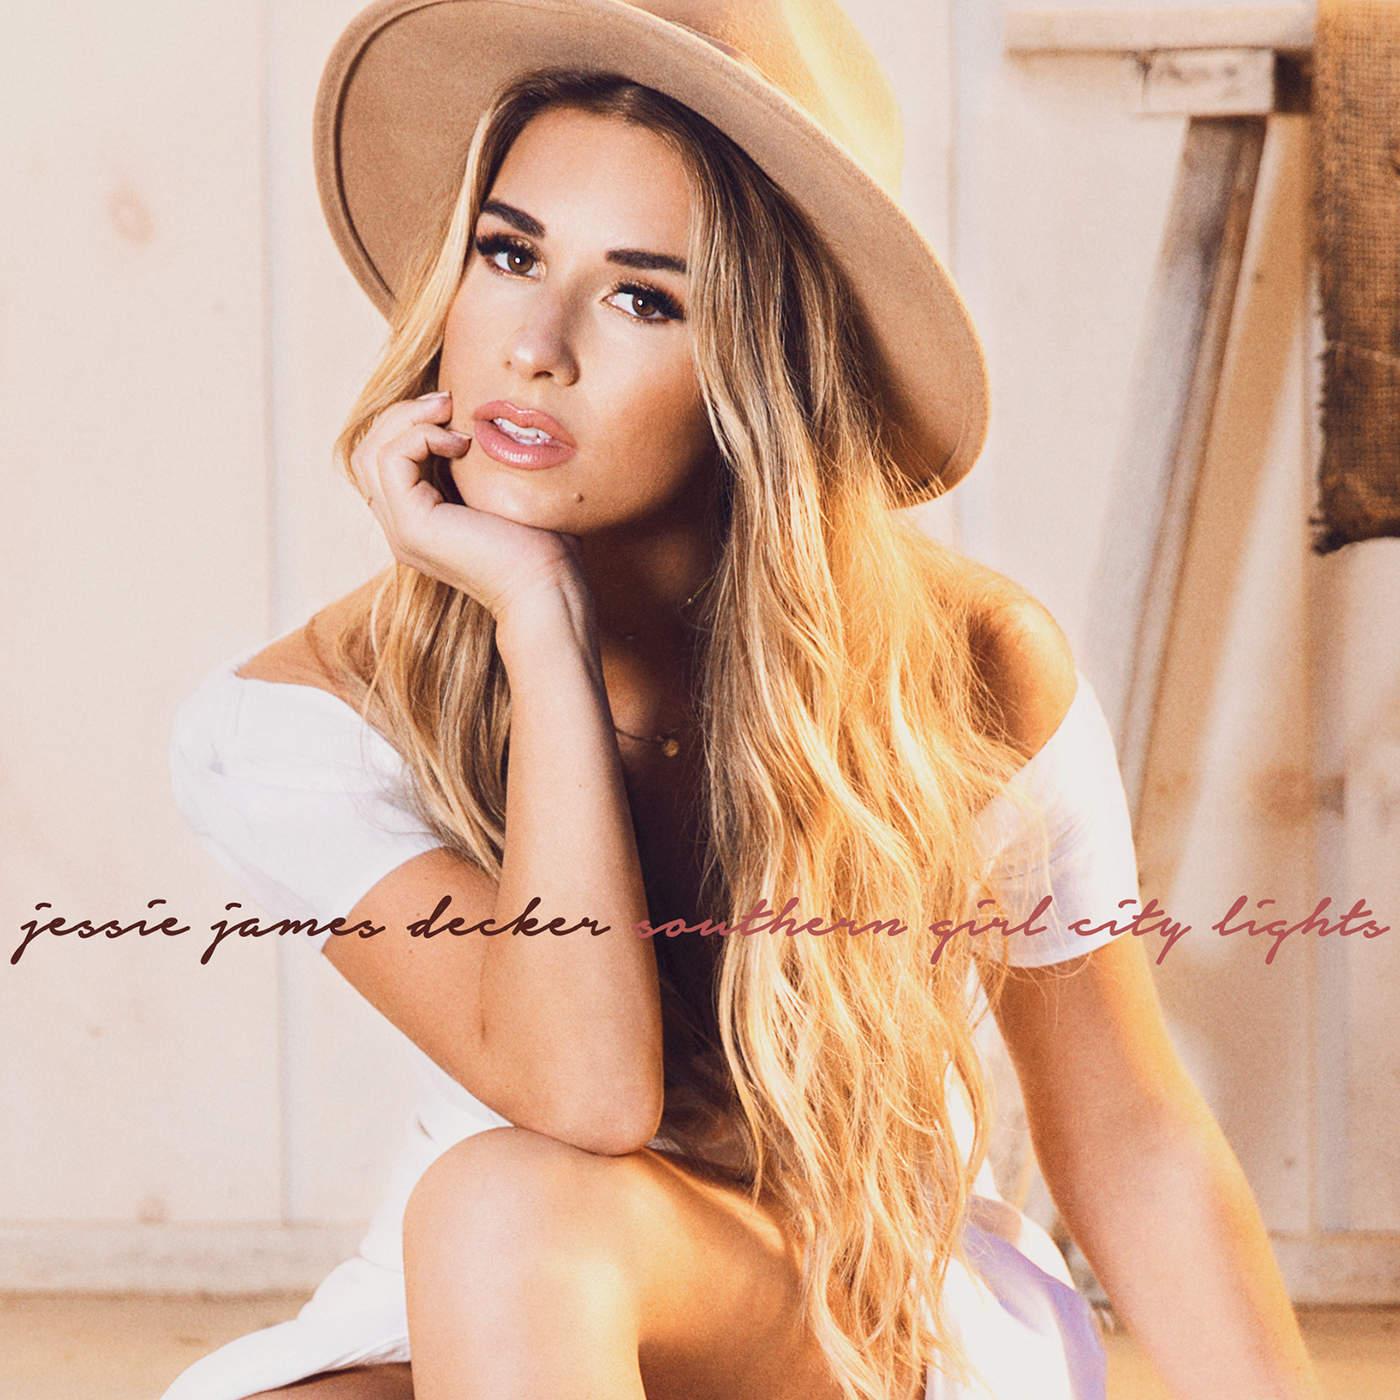 Jessie James Decker - Southern Girl City Lights